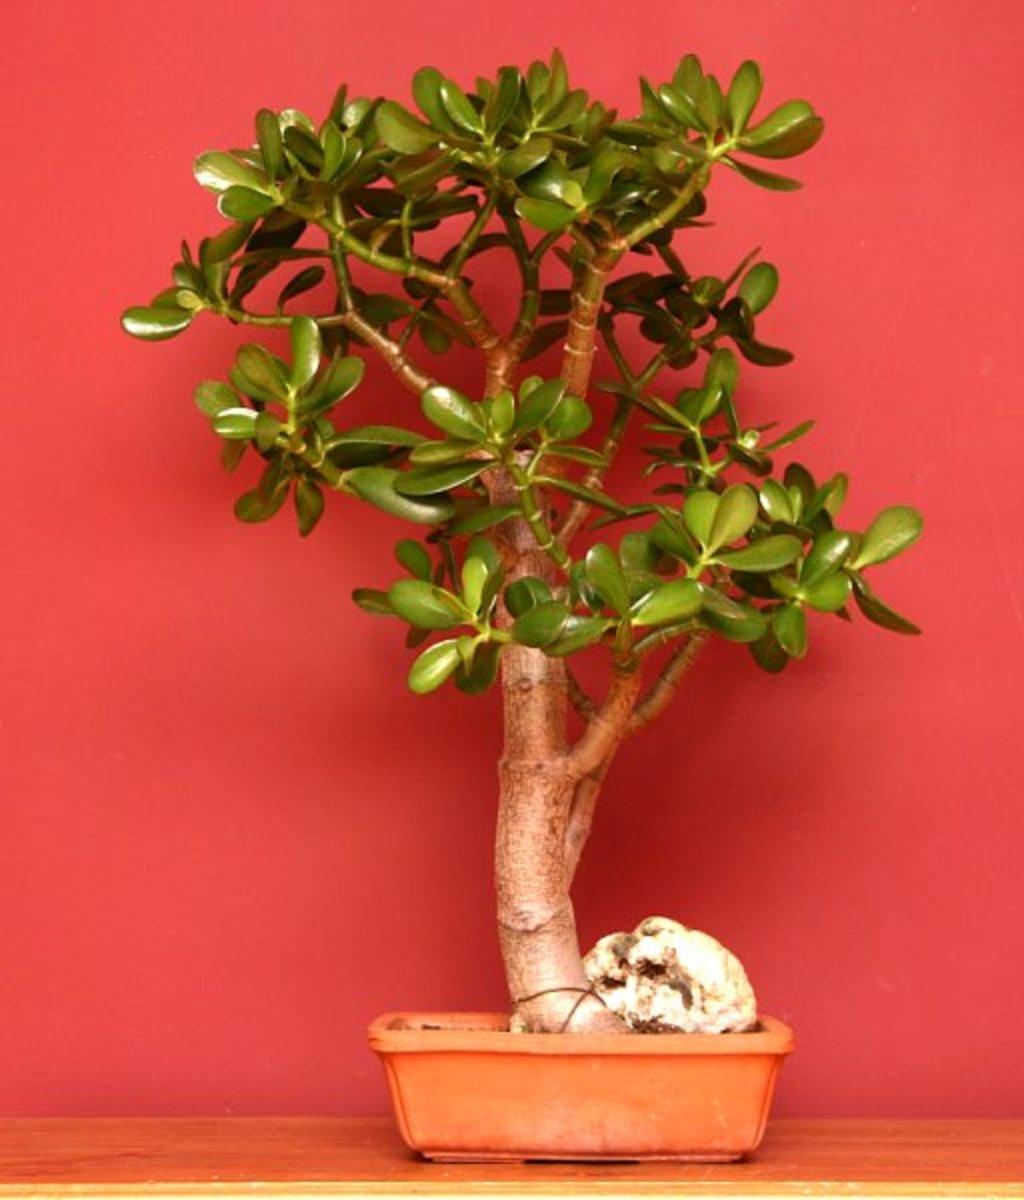 How To Grow A Jade Plant Dengarden Home And Garden